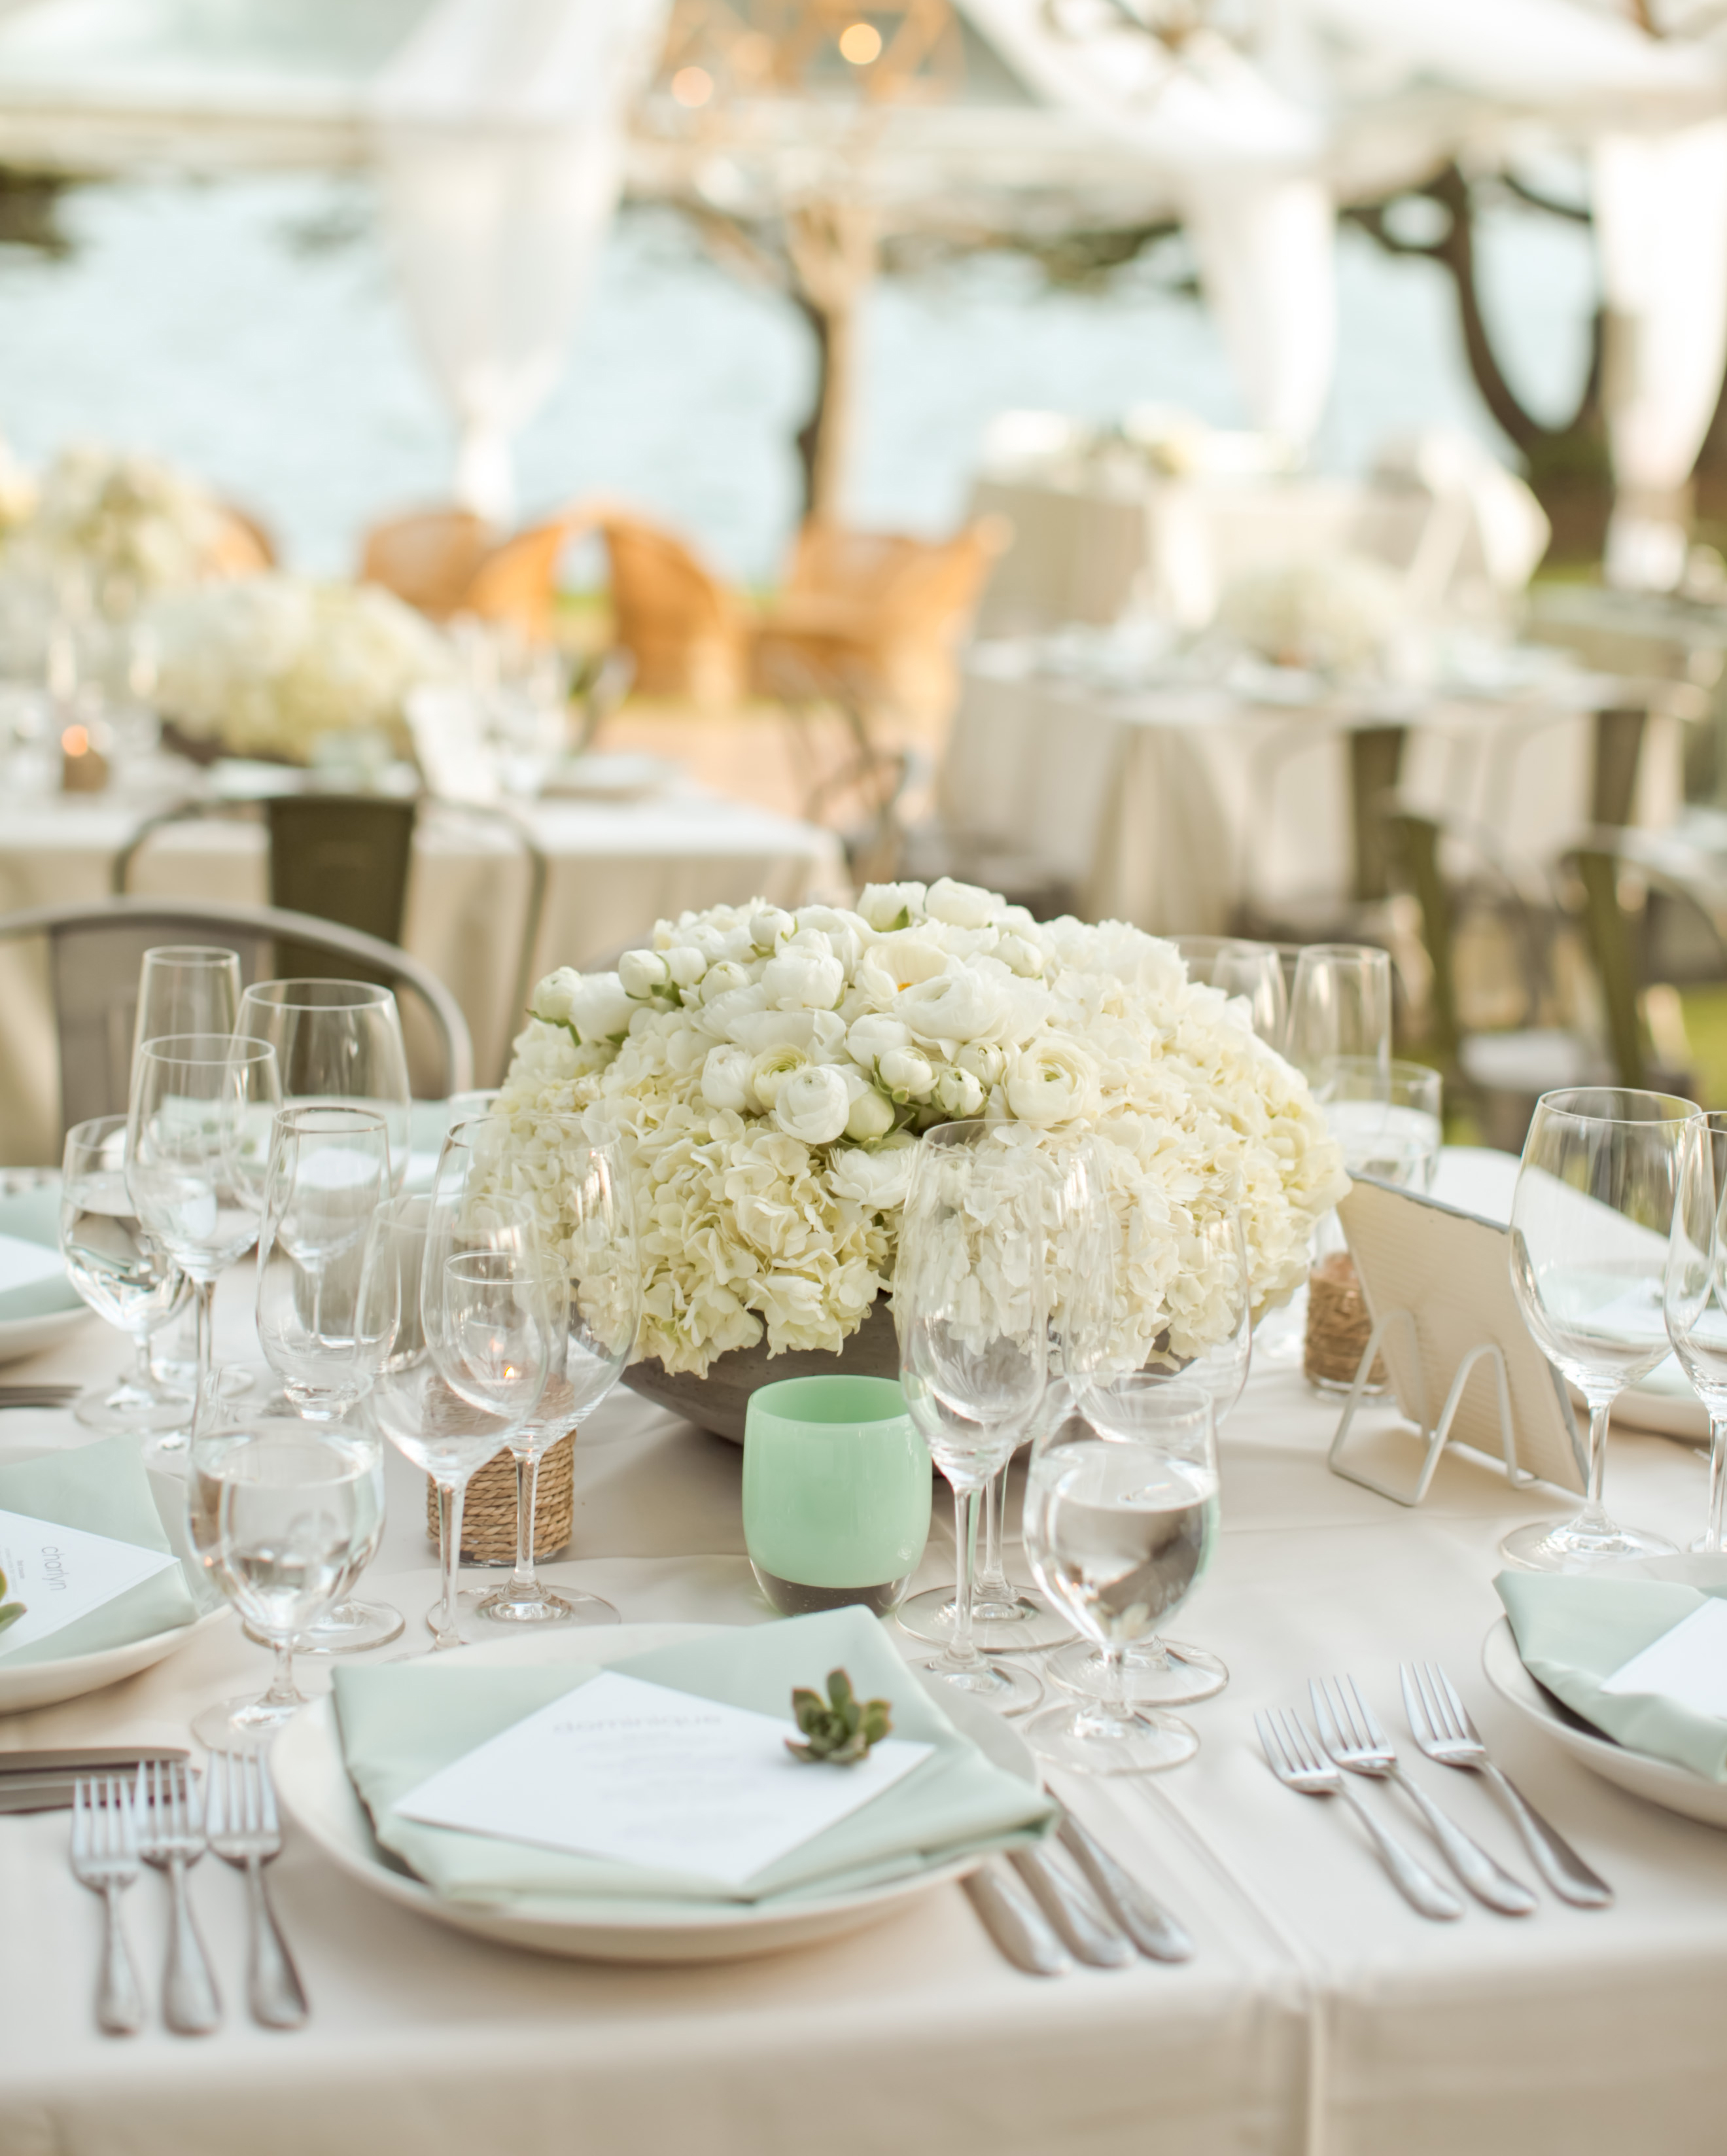 emma-michelle-wedding-table-1108-s112079-0715.jpg